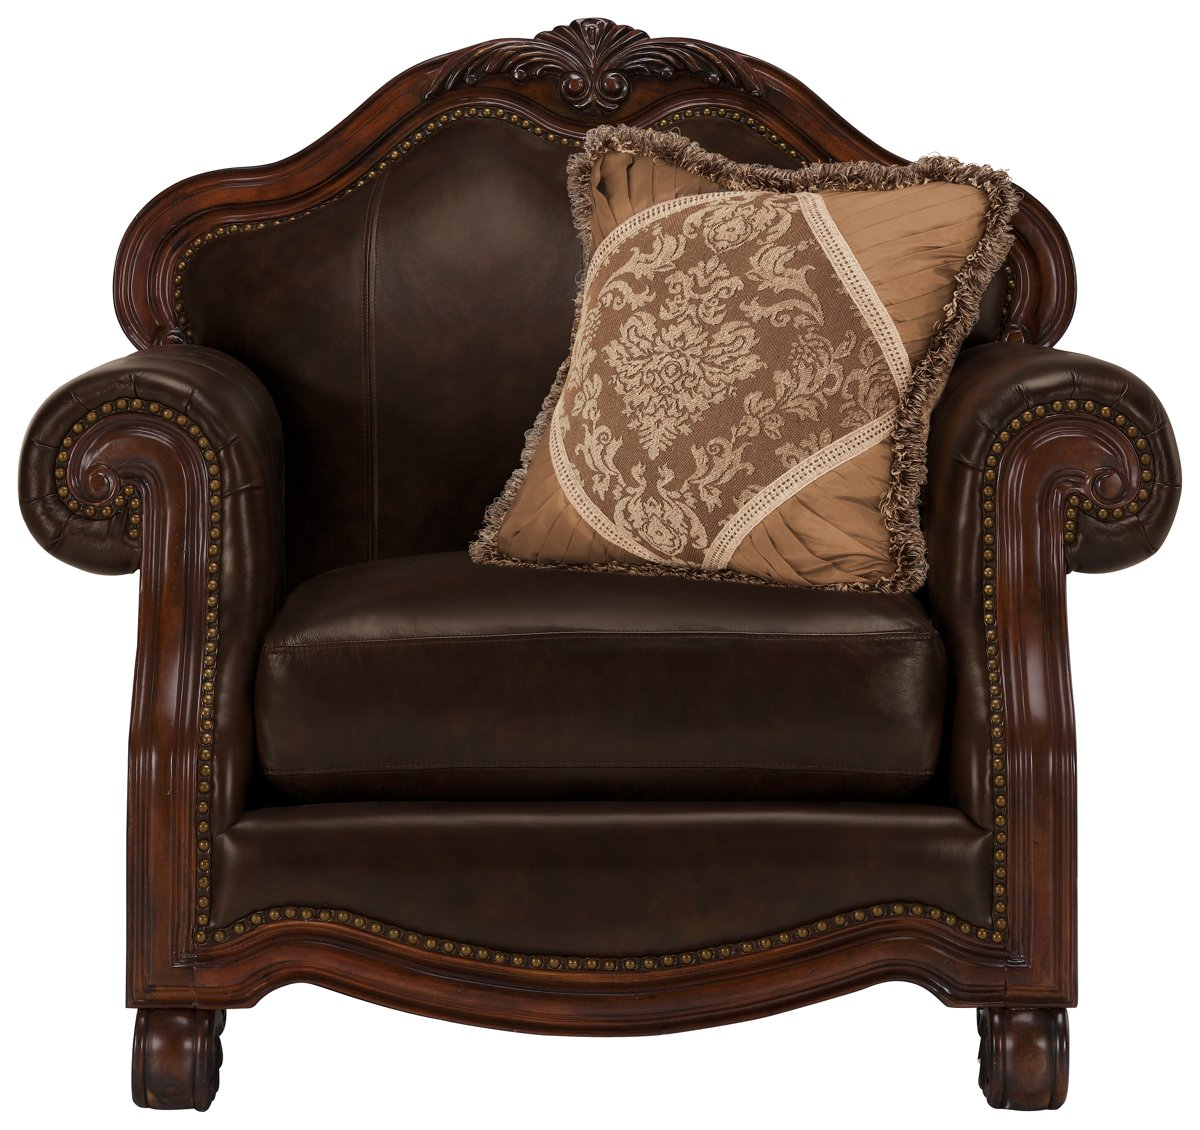 Regal Dark Tone Leather Chair